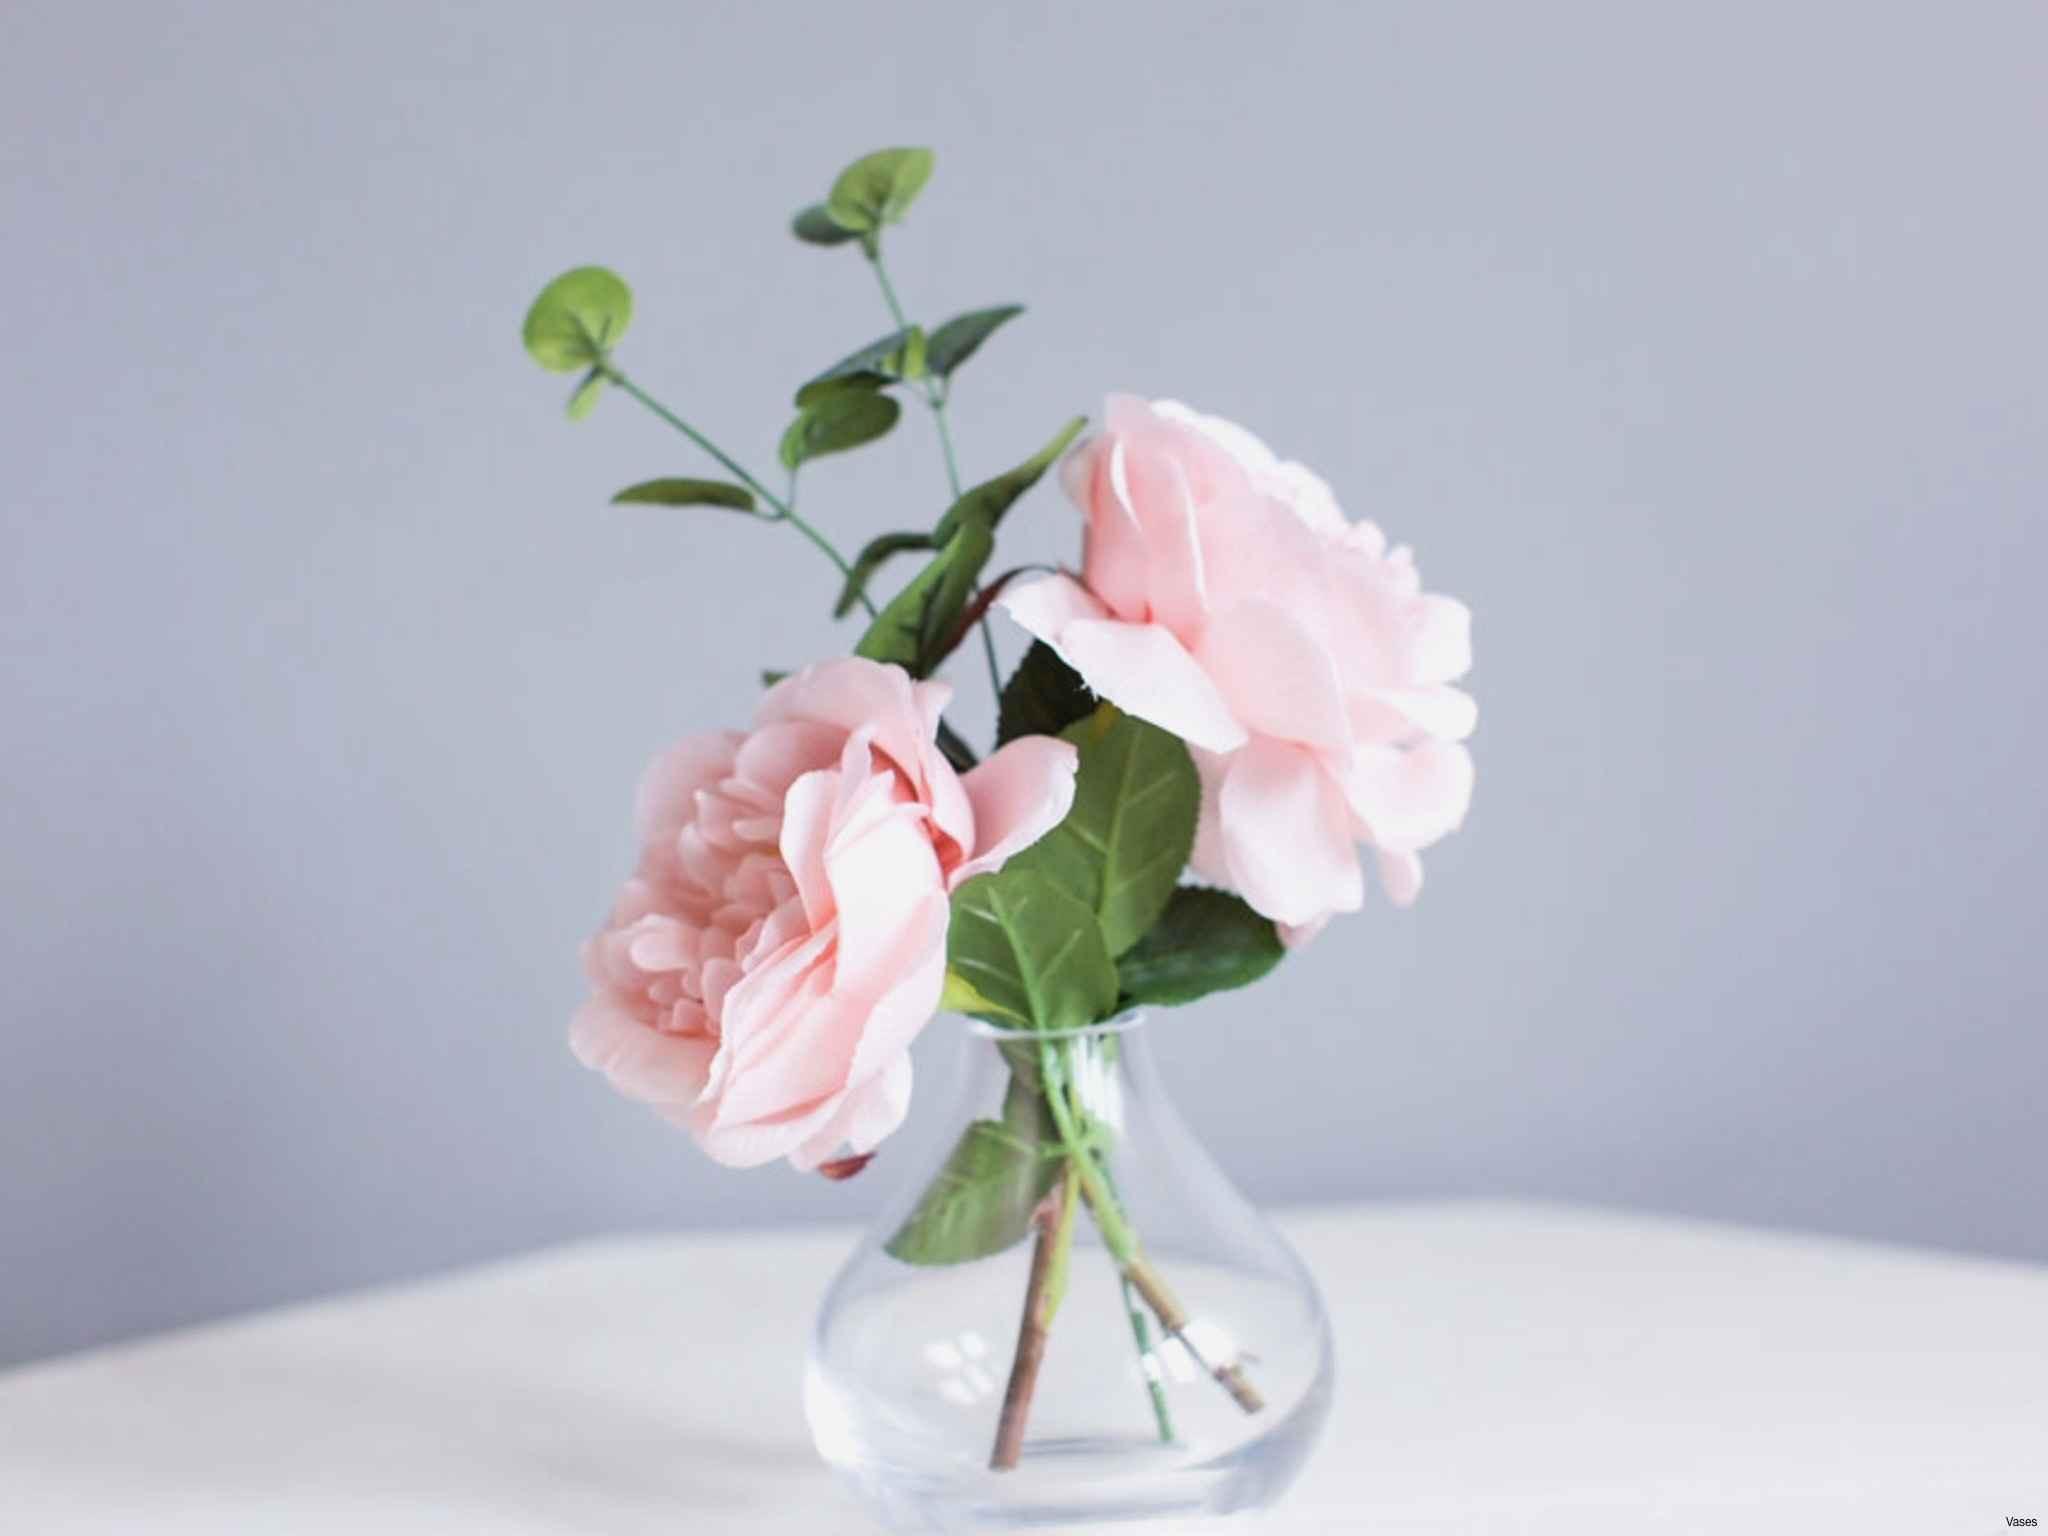 antique auto bud vases of elegant fall wedding bouquet wedding theme pertaining to silk flower wedding ideas h vases bud vase flower arrangements i 0d for inspiration design inspiration